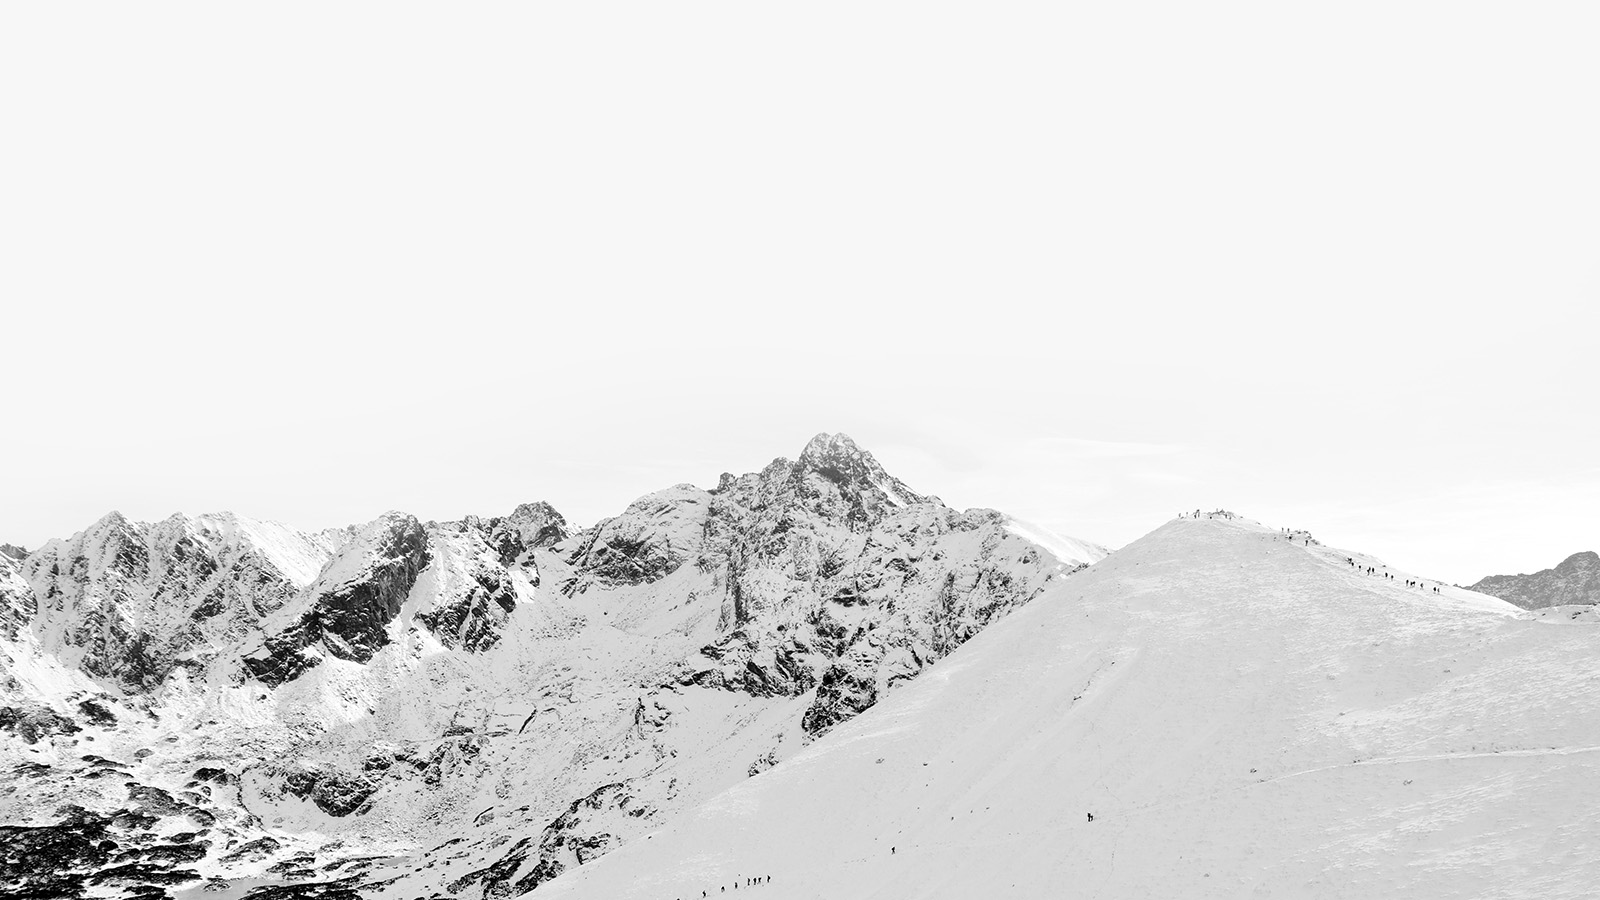 wallpaper for desktop, laptop | mt01-winter-mountain-snow ...